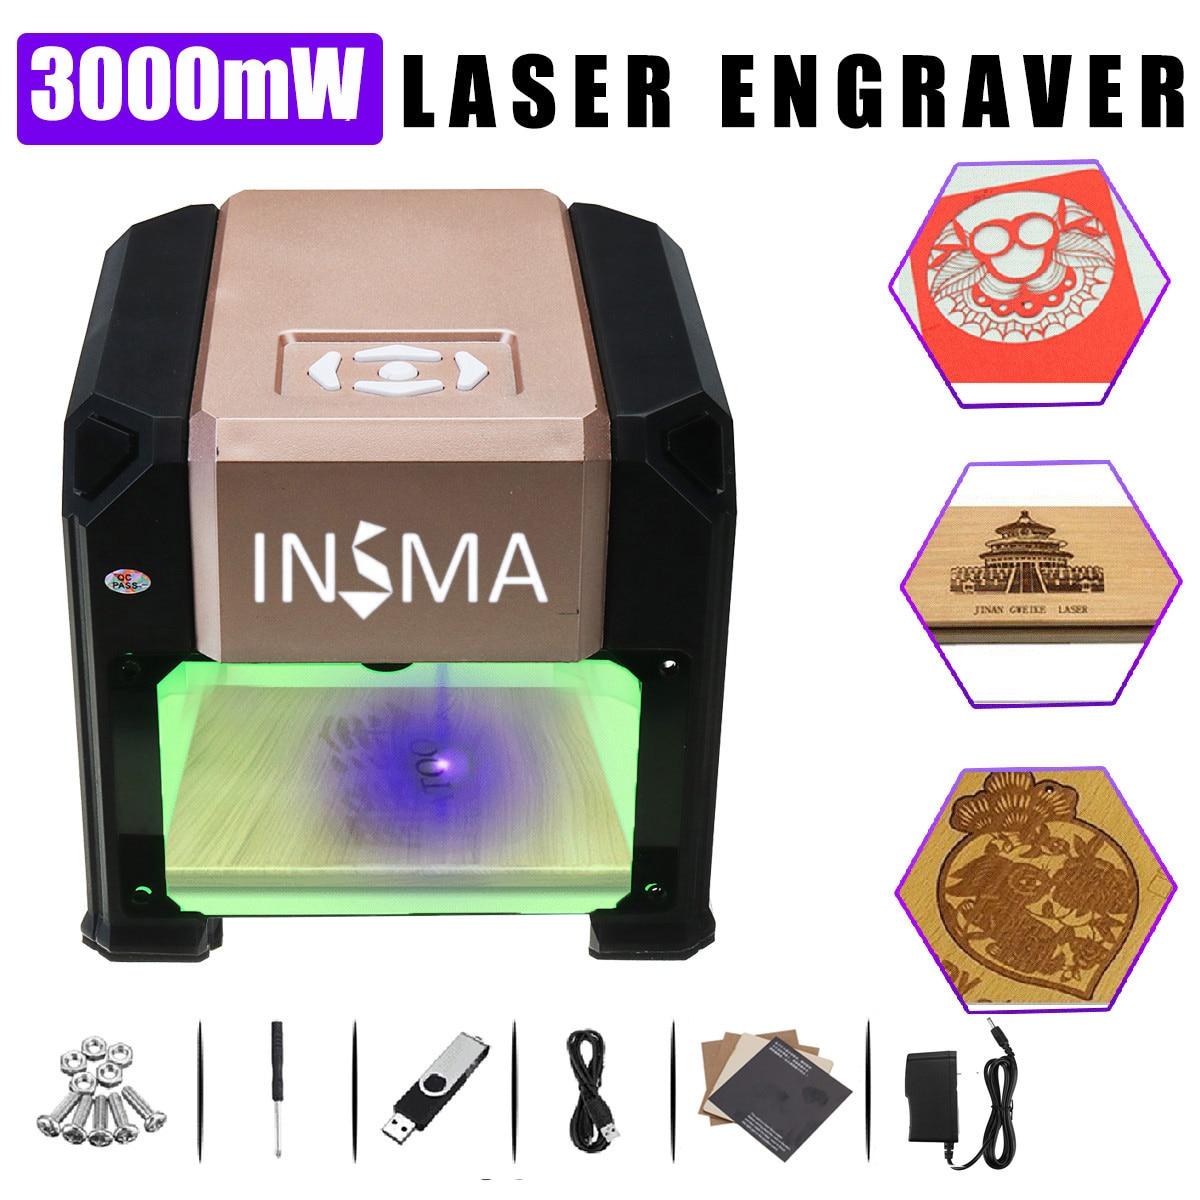 3000mW Desktop Laser Engraving Machine USB DIY Logo CNC Laser Engraver Printer With Heart Wooden Board